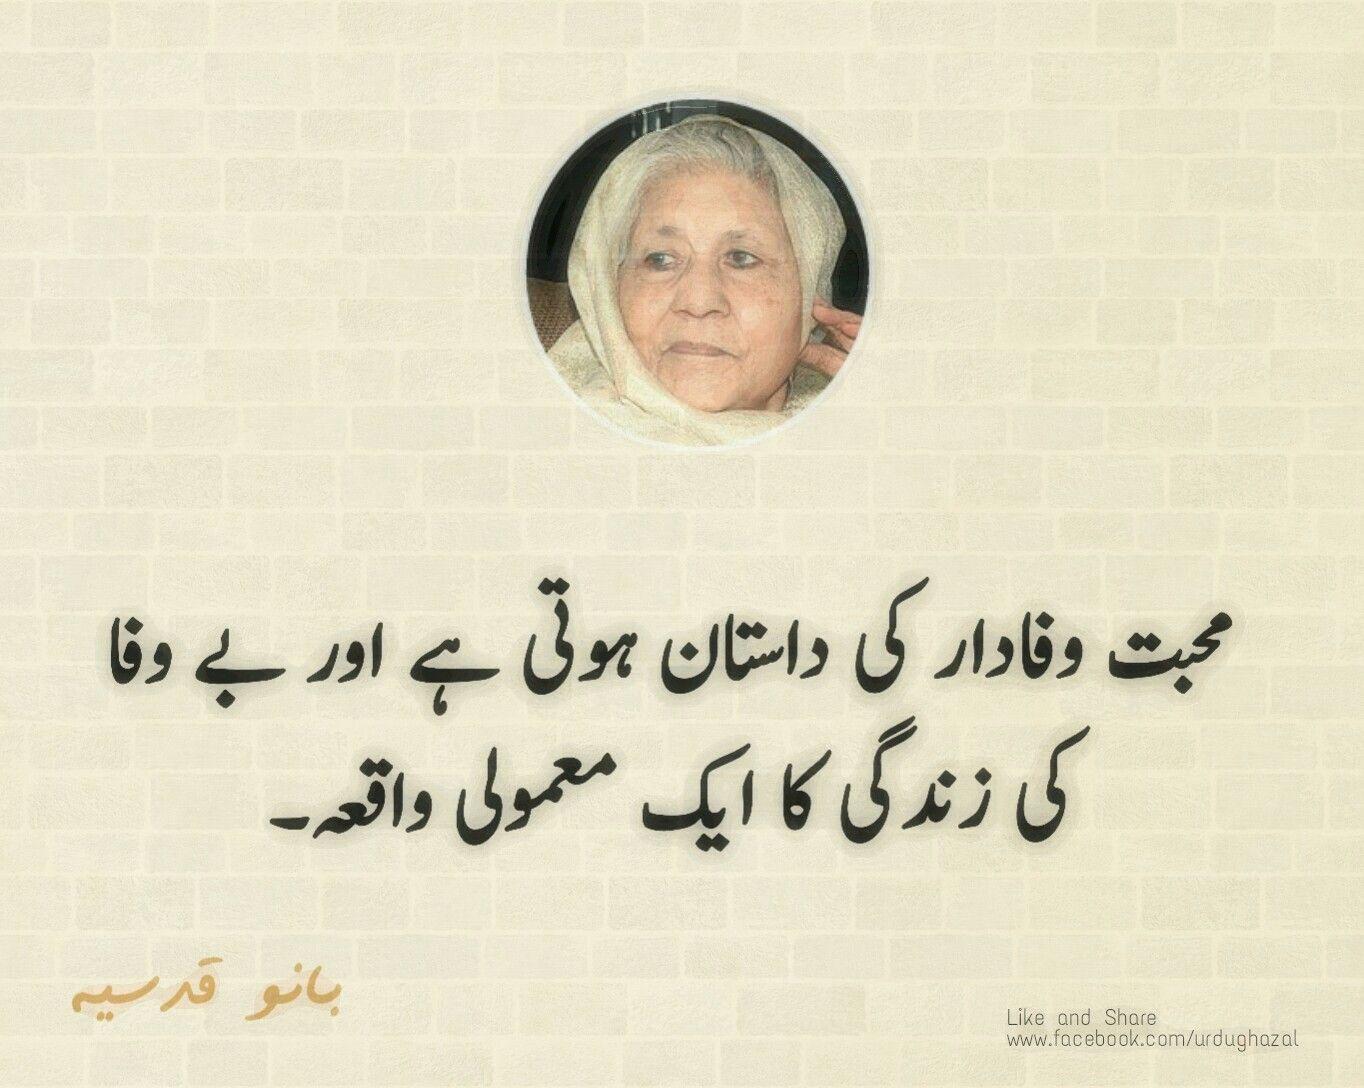 Pin by Urdu Ghazal اردو غزل on Bano Qudsia | Bano qudsia ...